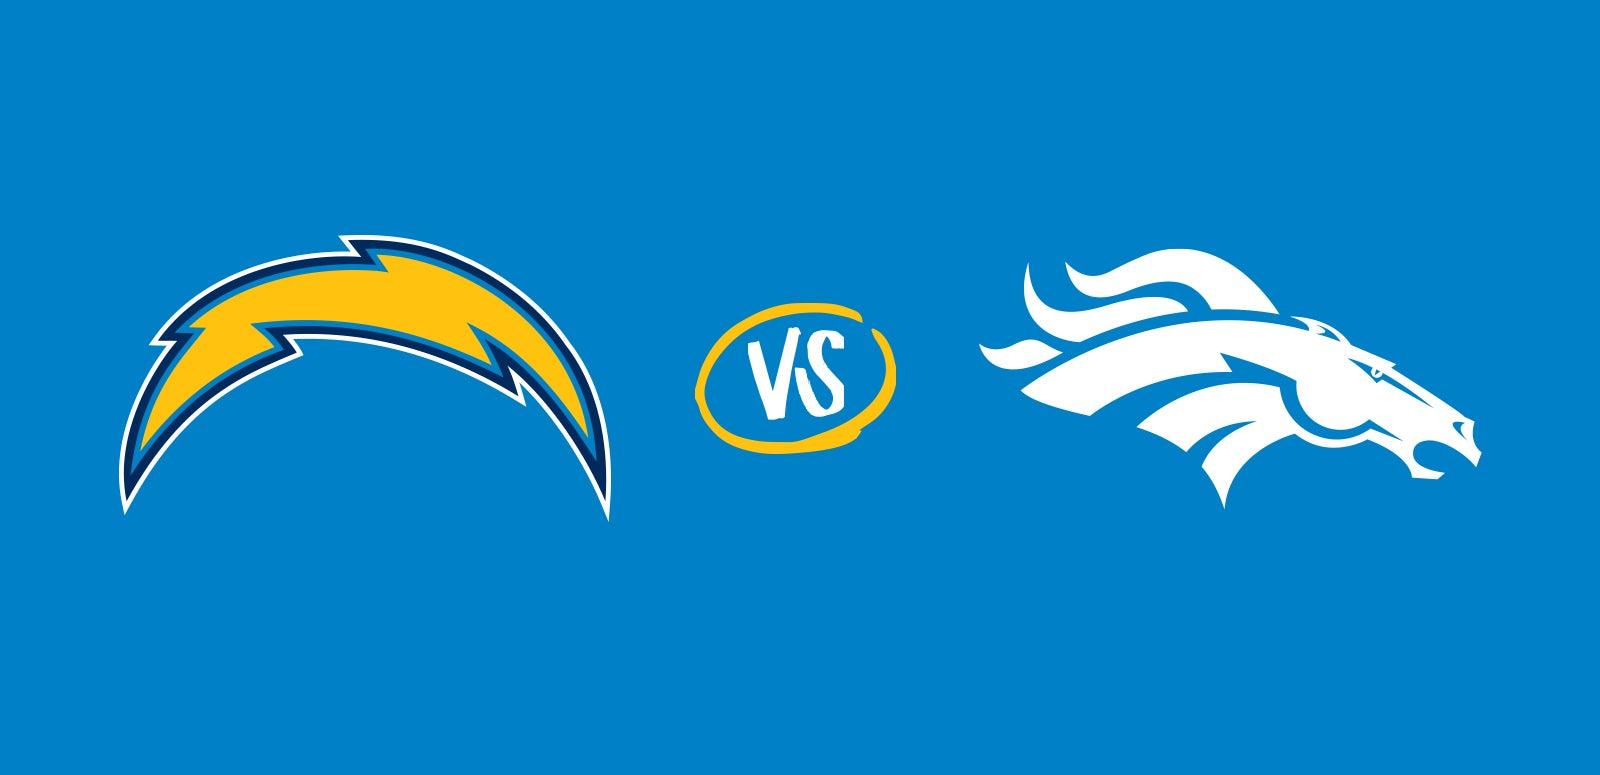 NFL: Los Angeles Chargers vs. Denver Broncos